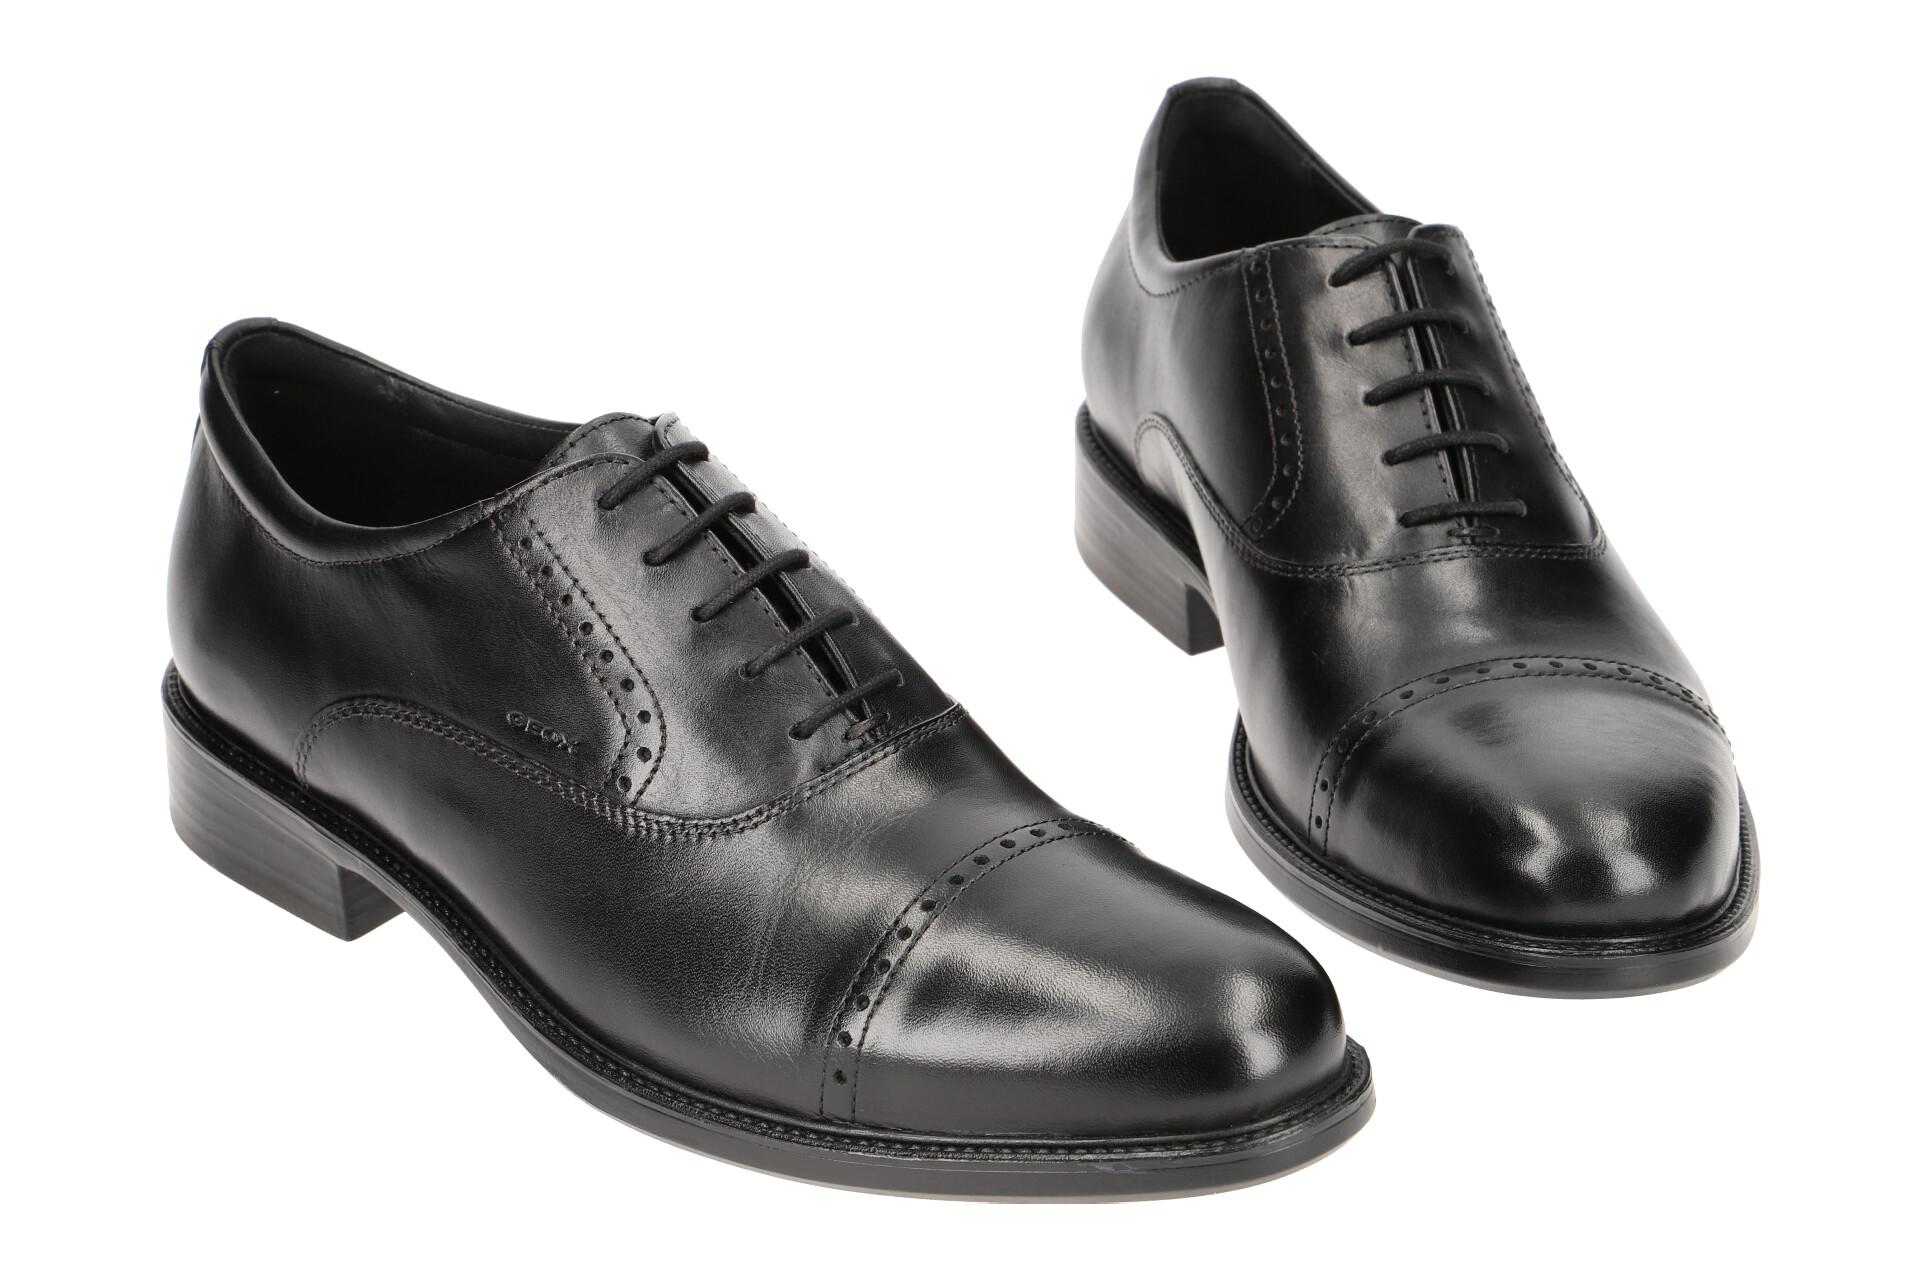 Schuhe 00043 Herrenschuhe Carnaby C9999 Elegante Halbschuhe Details Schwarz U92w1a Zu Geox 7ygvf6IYbm